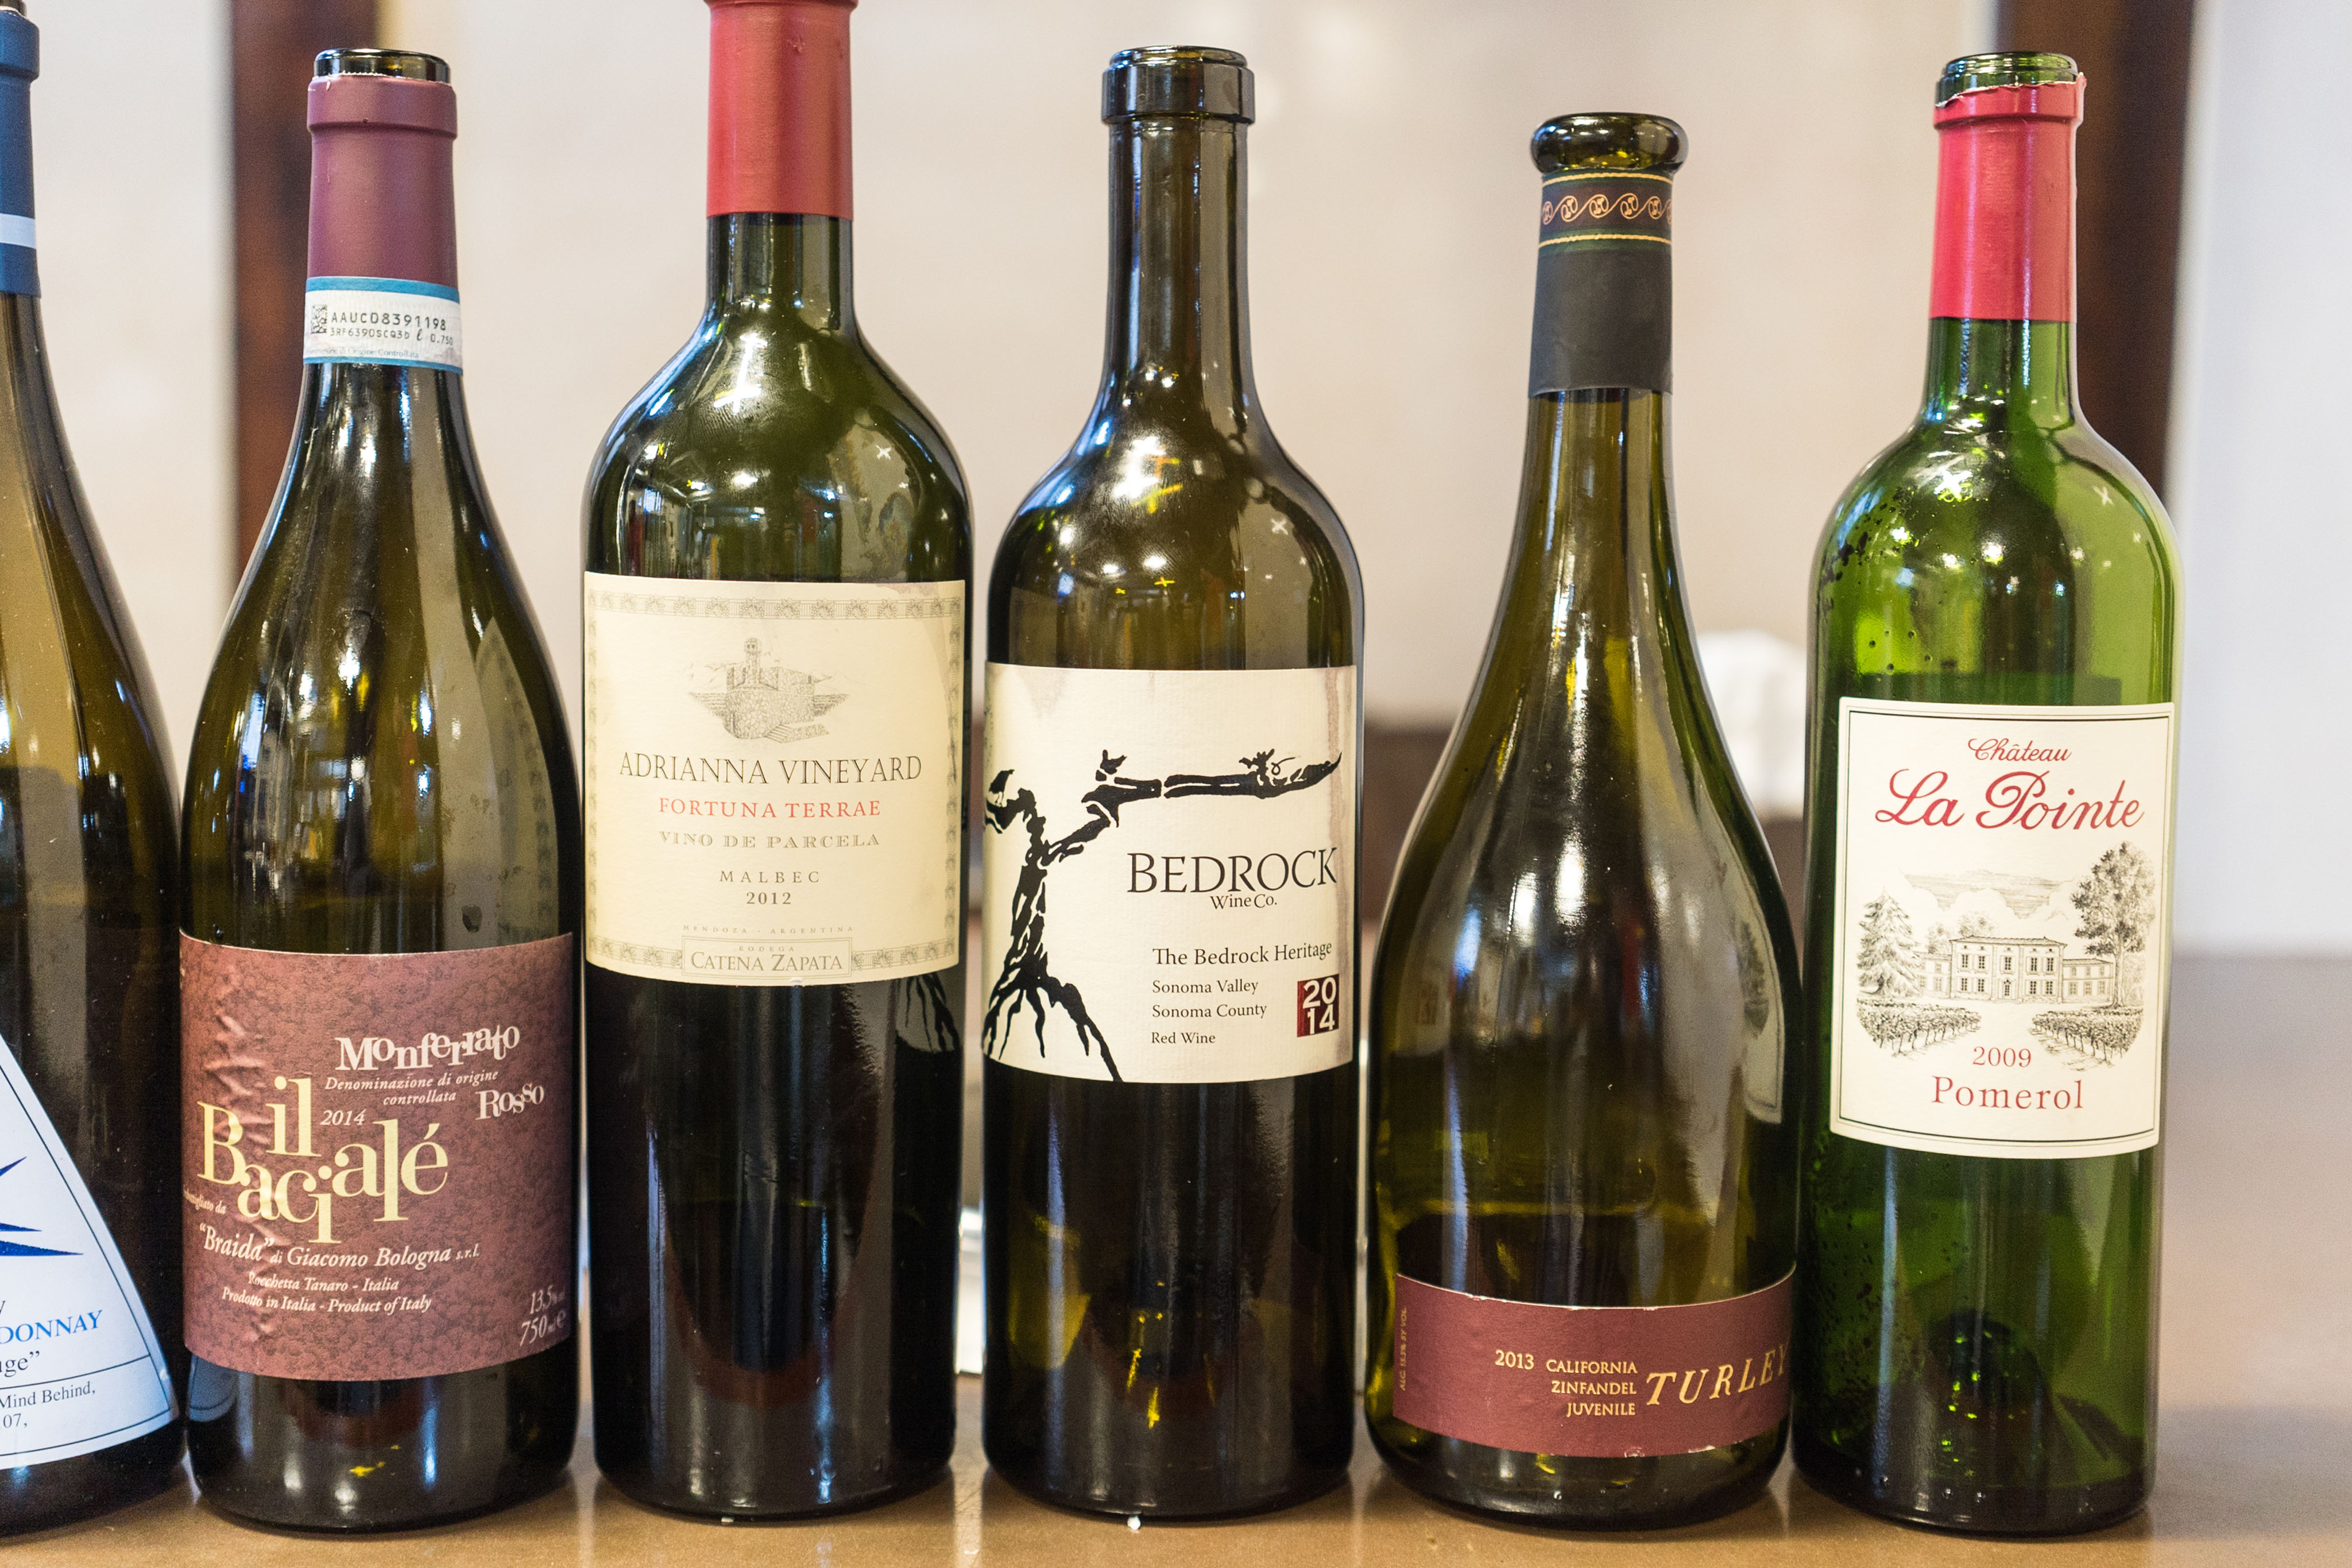 The Bedrock Heritage Bedrock Vineyard 2014